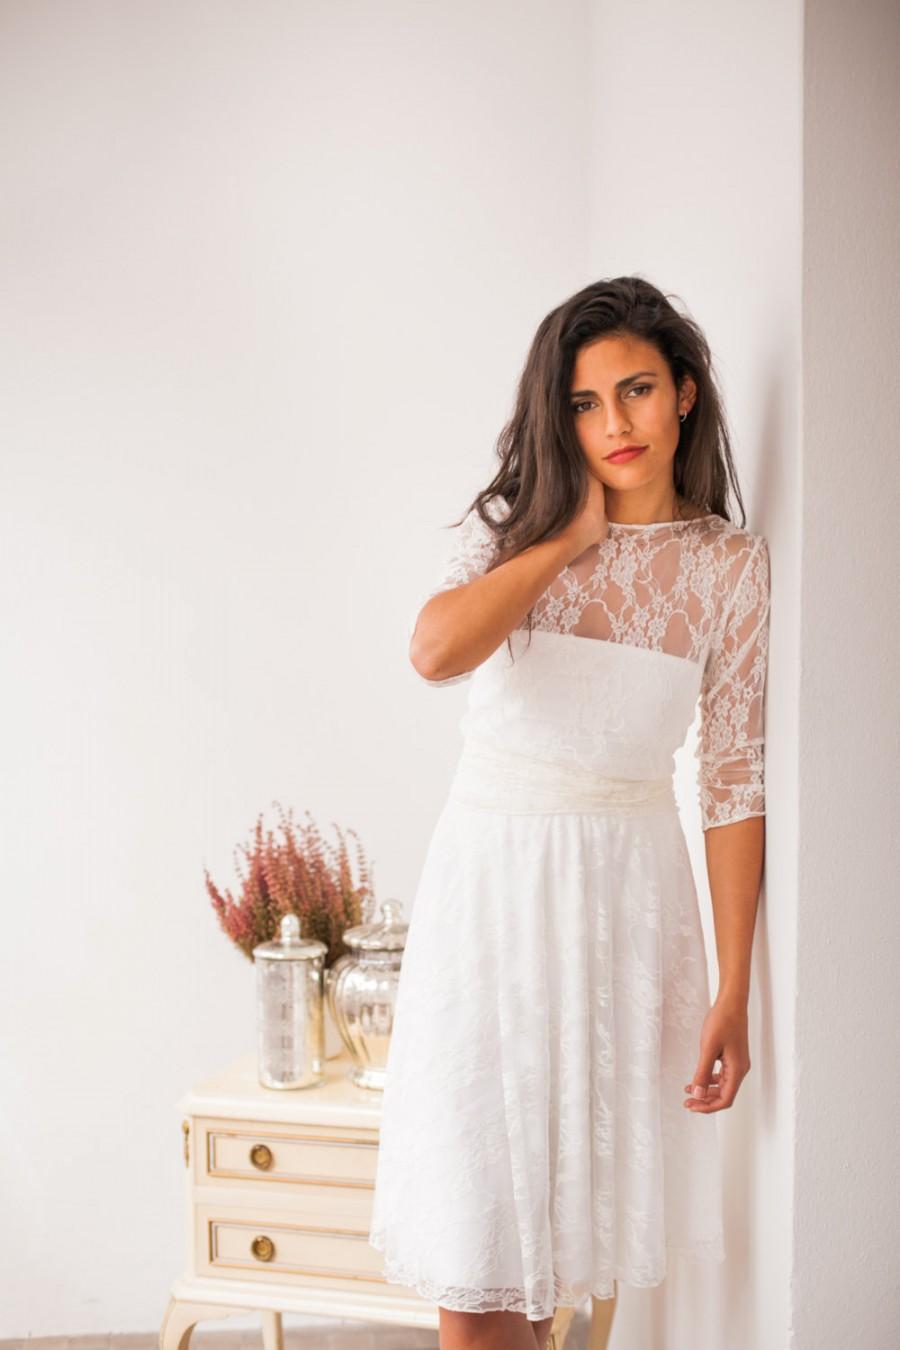 Boda - Long sleeve lace wedding dress, full lace wedding dress, short wedding dress, open back wedding dress, wrap dress, lace wedding dress, ivory